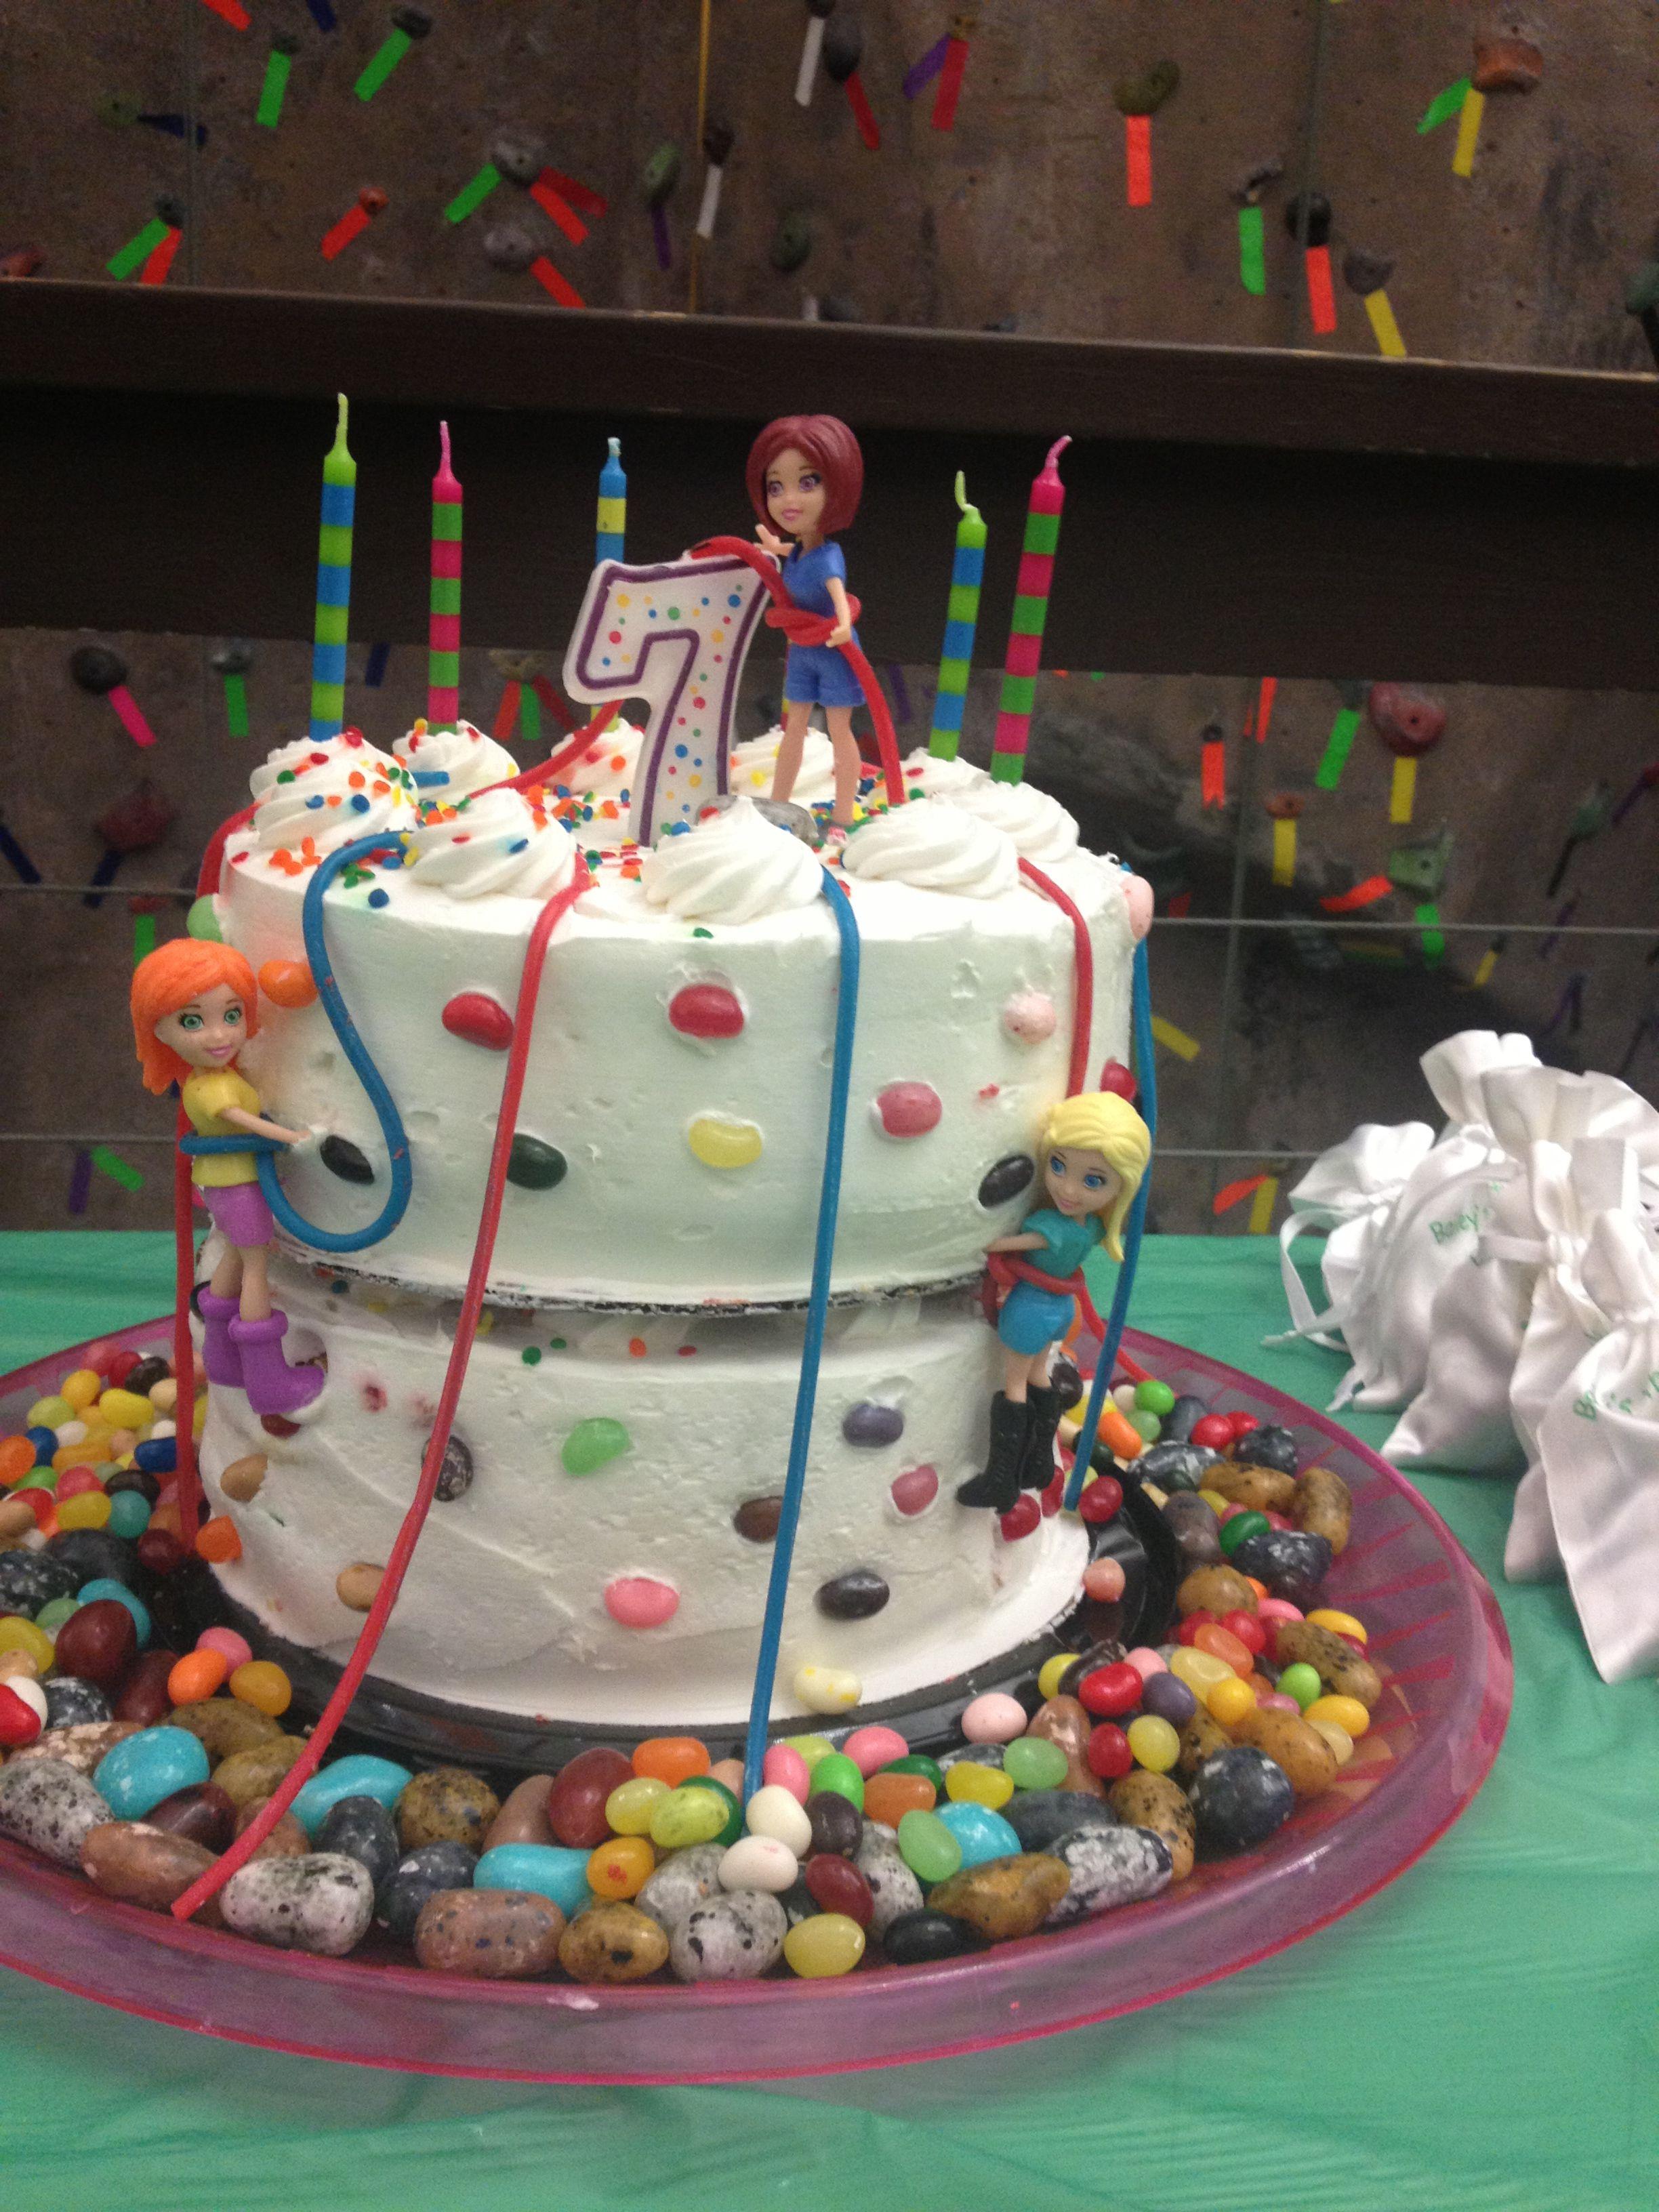 Miraculous Rock Climbing Birthday Cake With Images Rock Climbing Cake Funny Birthday Cards Online Barepcheapnameinfo